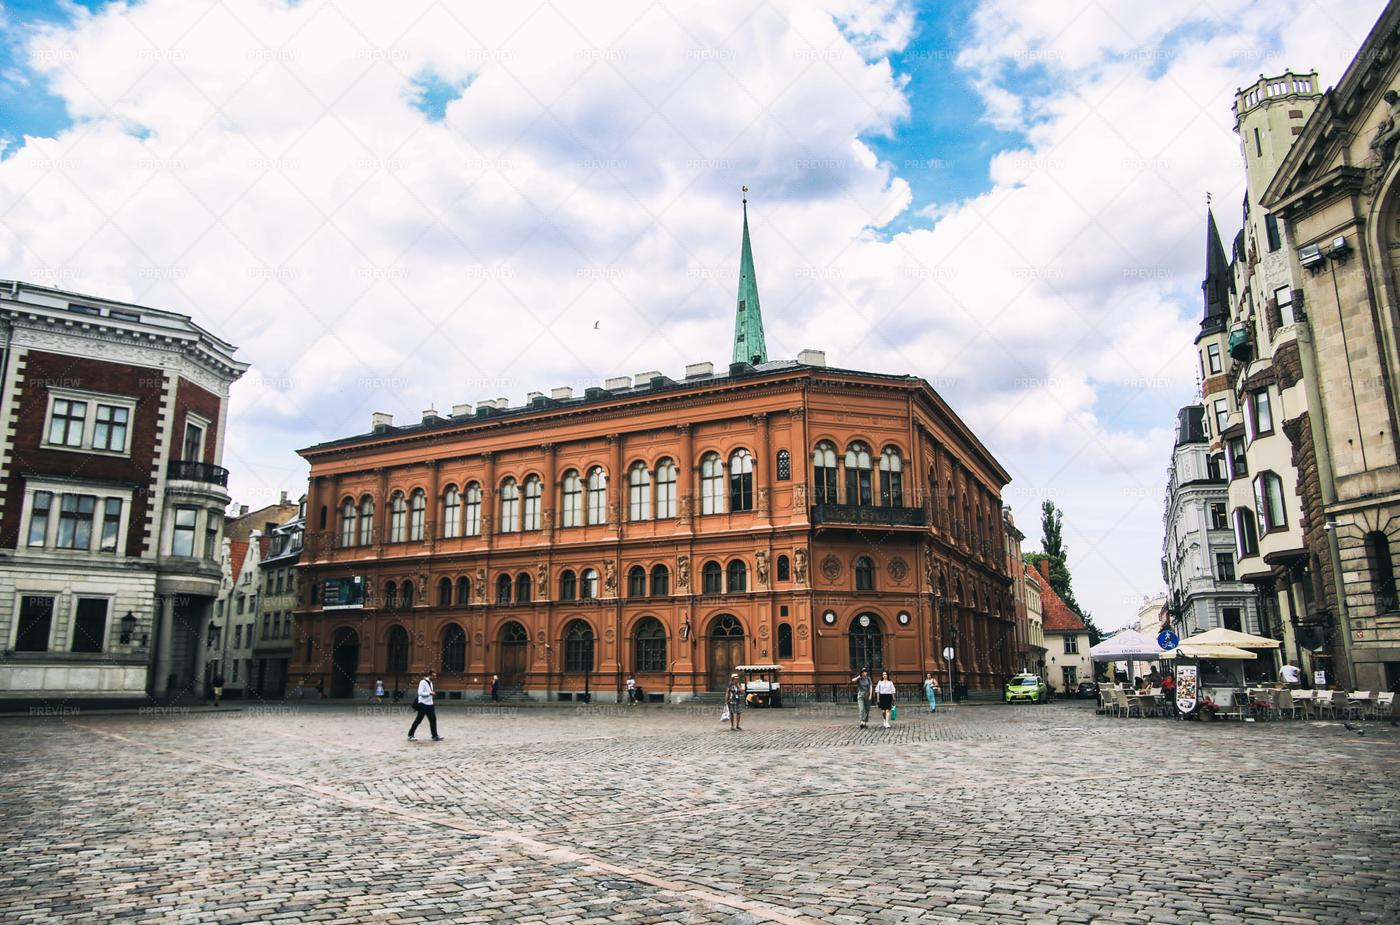 Ancient Buildings In Riga: Stock Photos